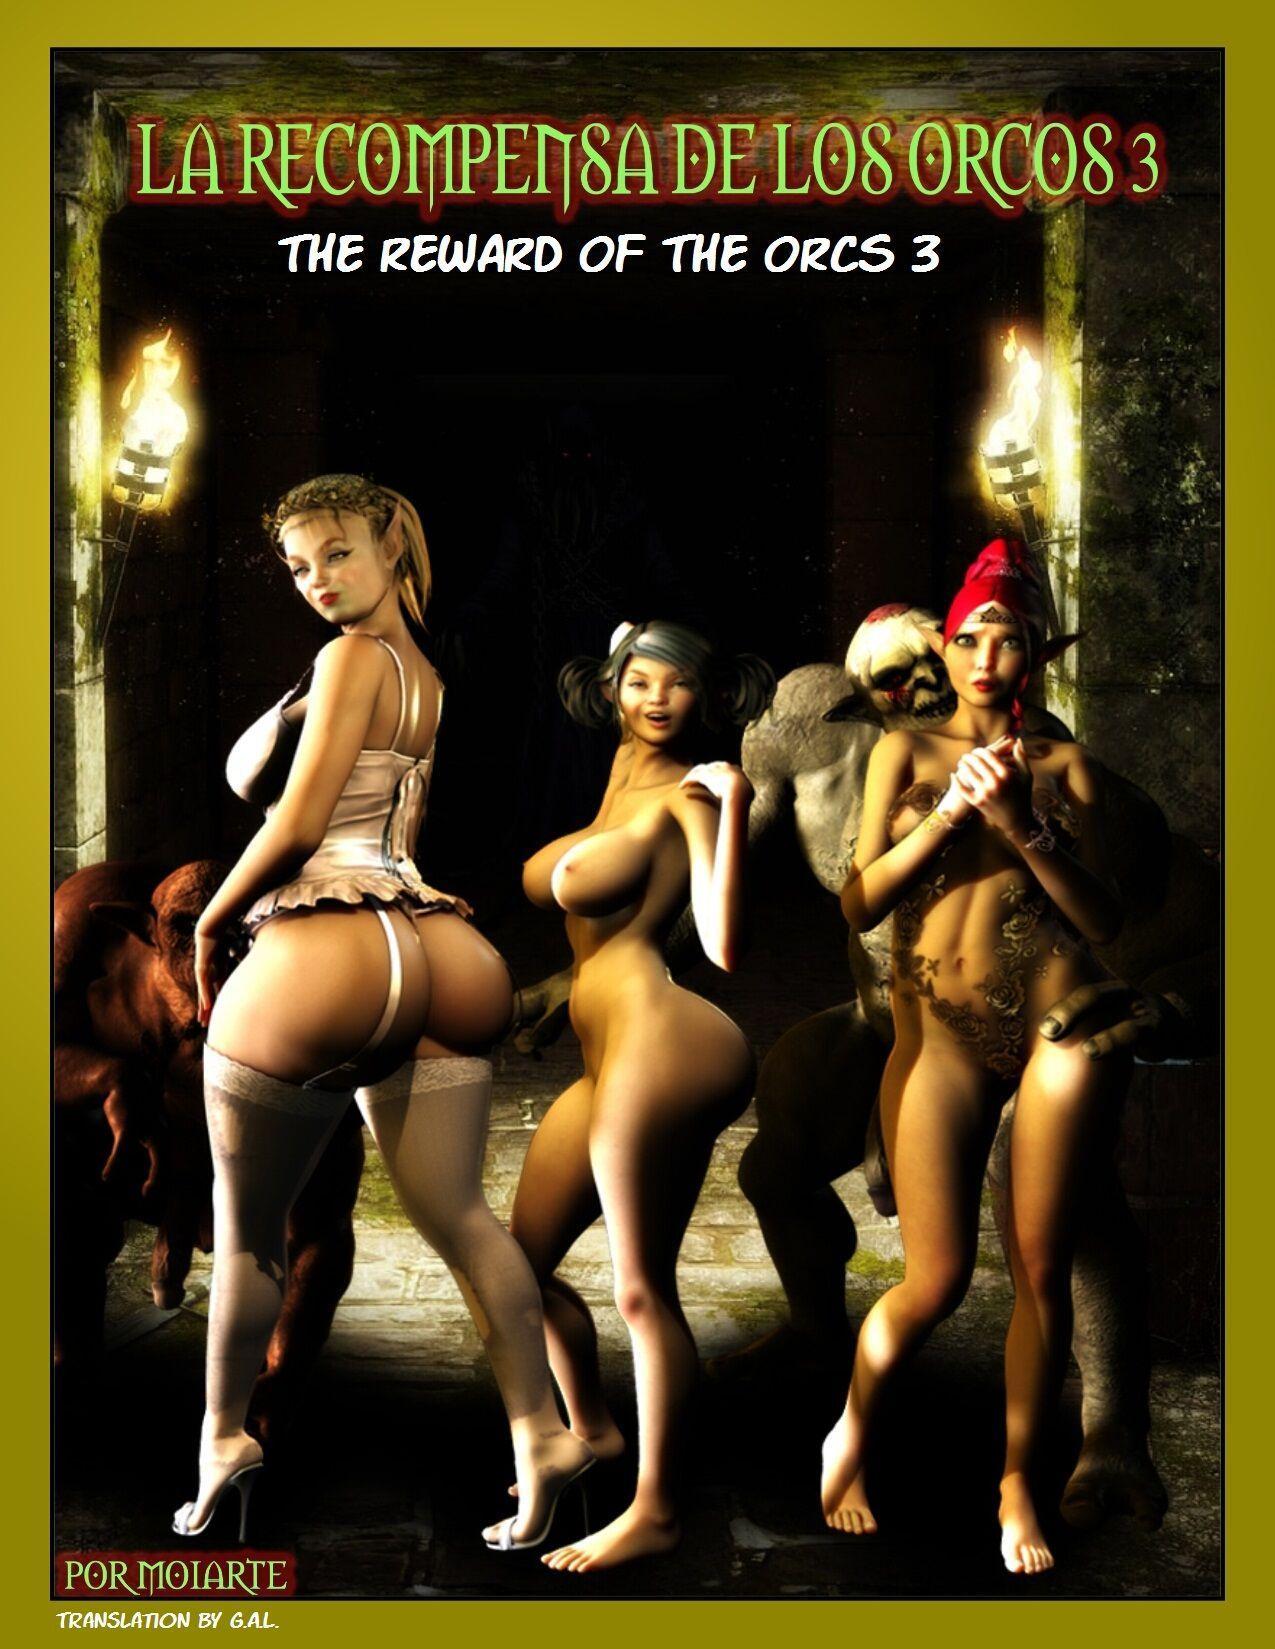 [MOIARTE] THE REWARD OF THE ORCS VOL.3 (ENGLISH)